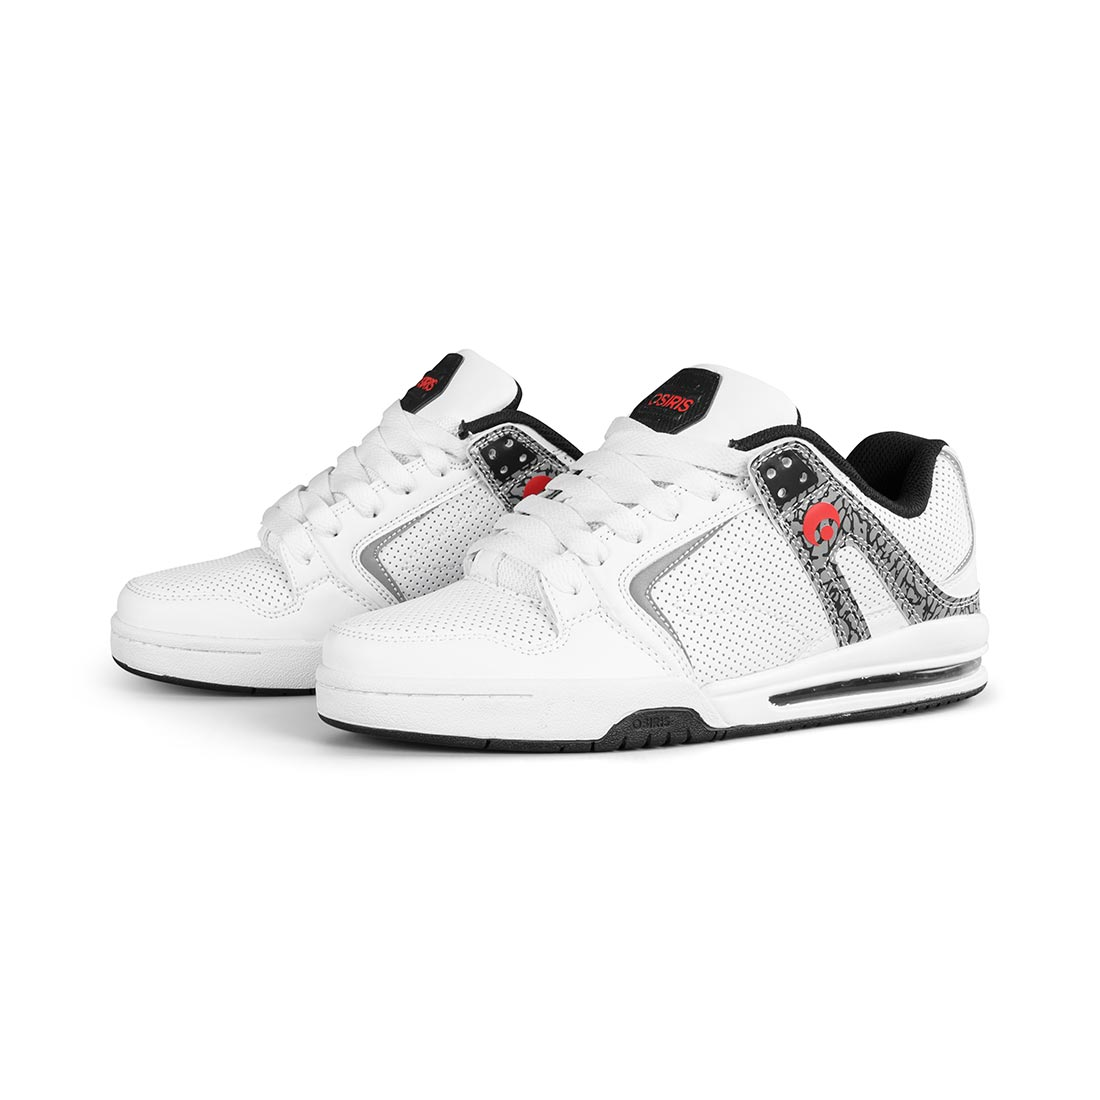 Osiris PXL Shoes - White / Red